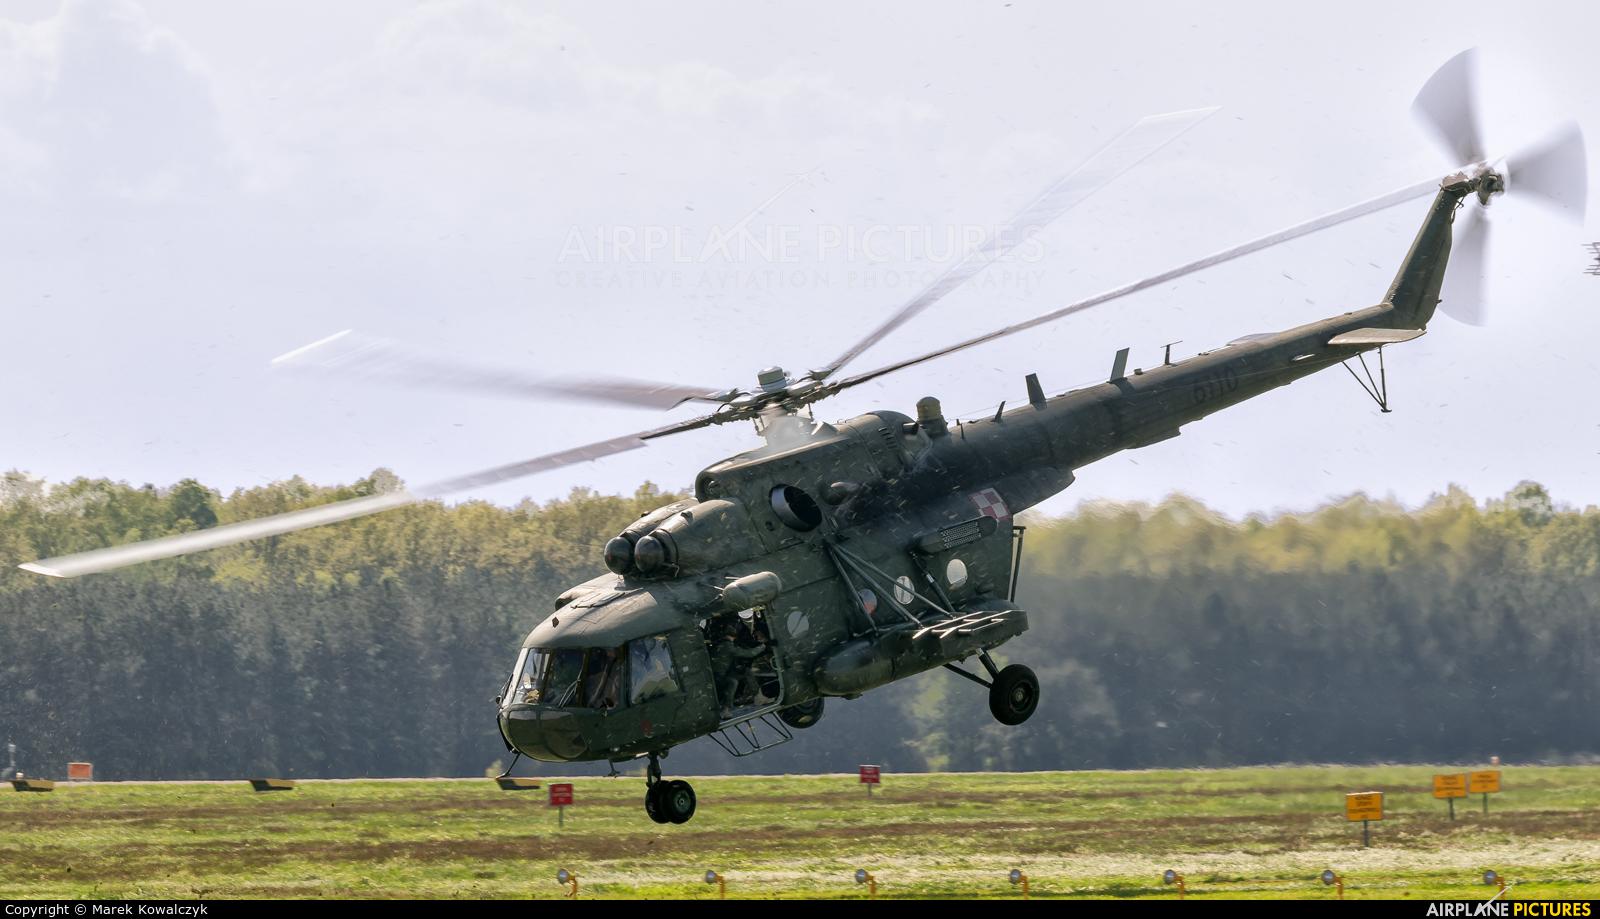 Poland- Special Forces 6110 aircraft at Powidz